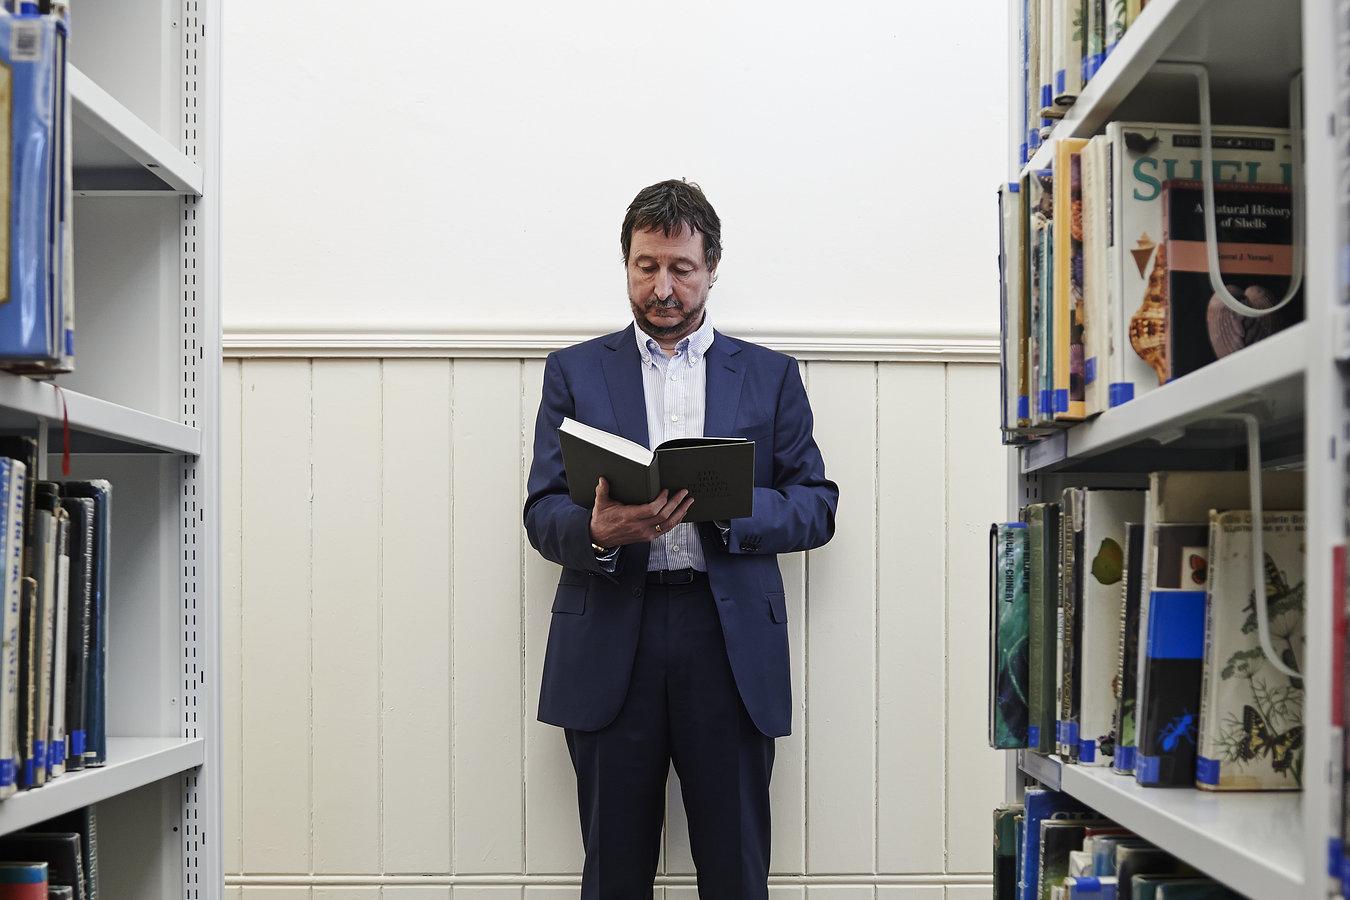 N170-Vice-Chancellor Professor John Last